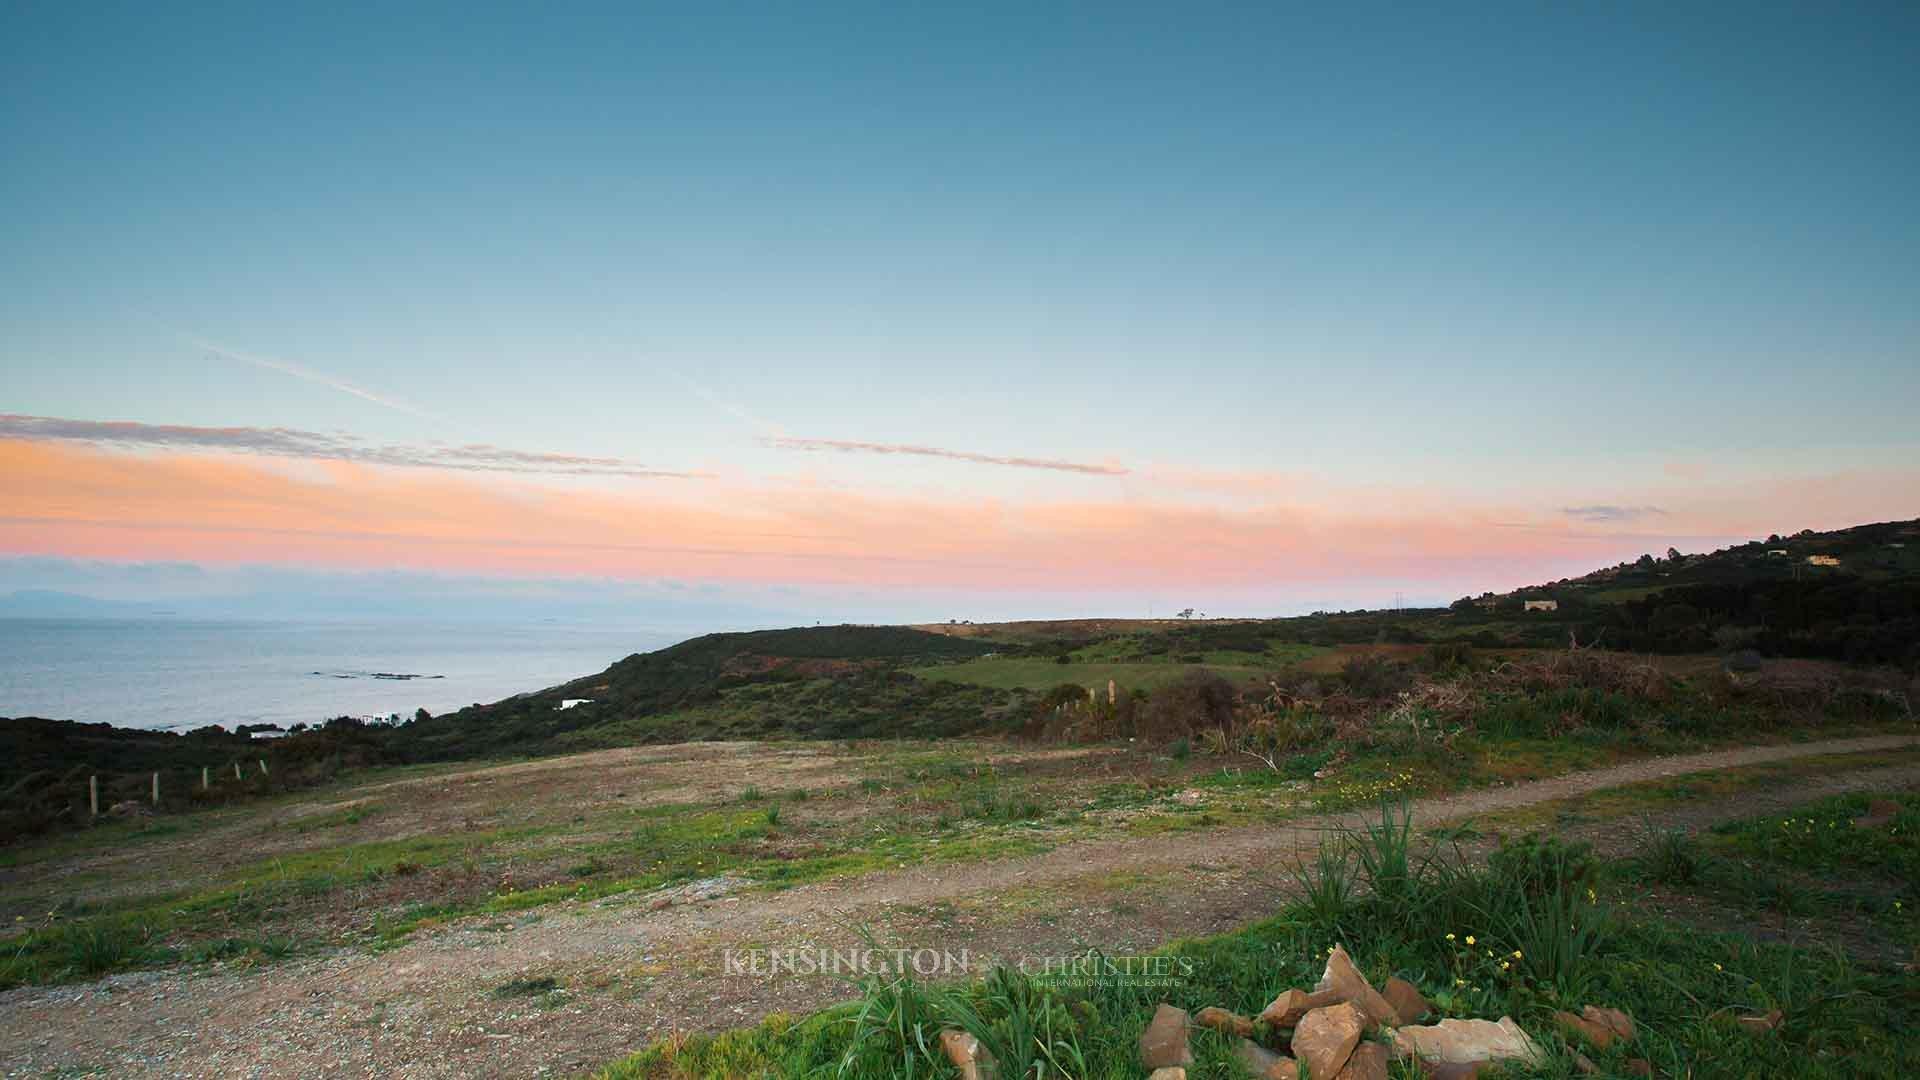 KPPM01168: Terrain Malabata Terrain constructible Tanger Maroc